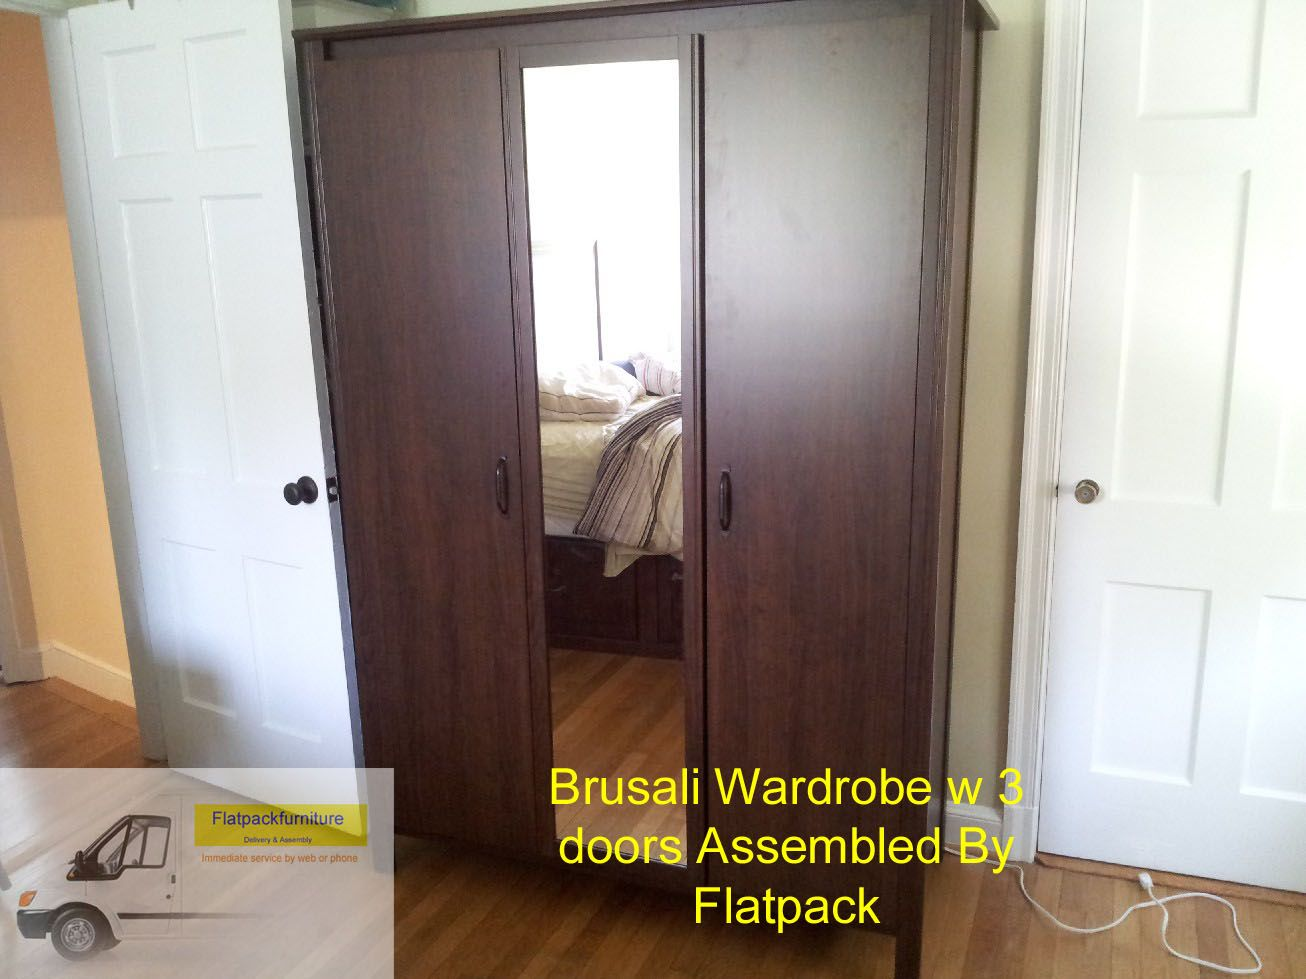 Ikea brusali wardrobe with doors article number best